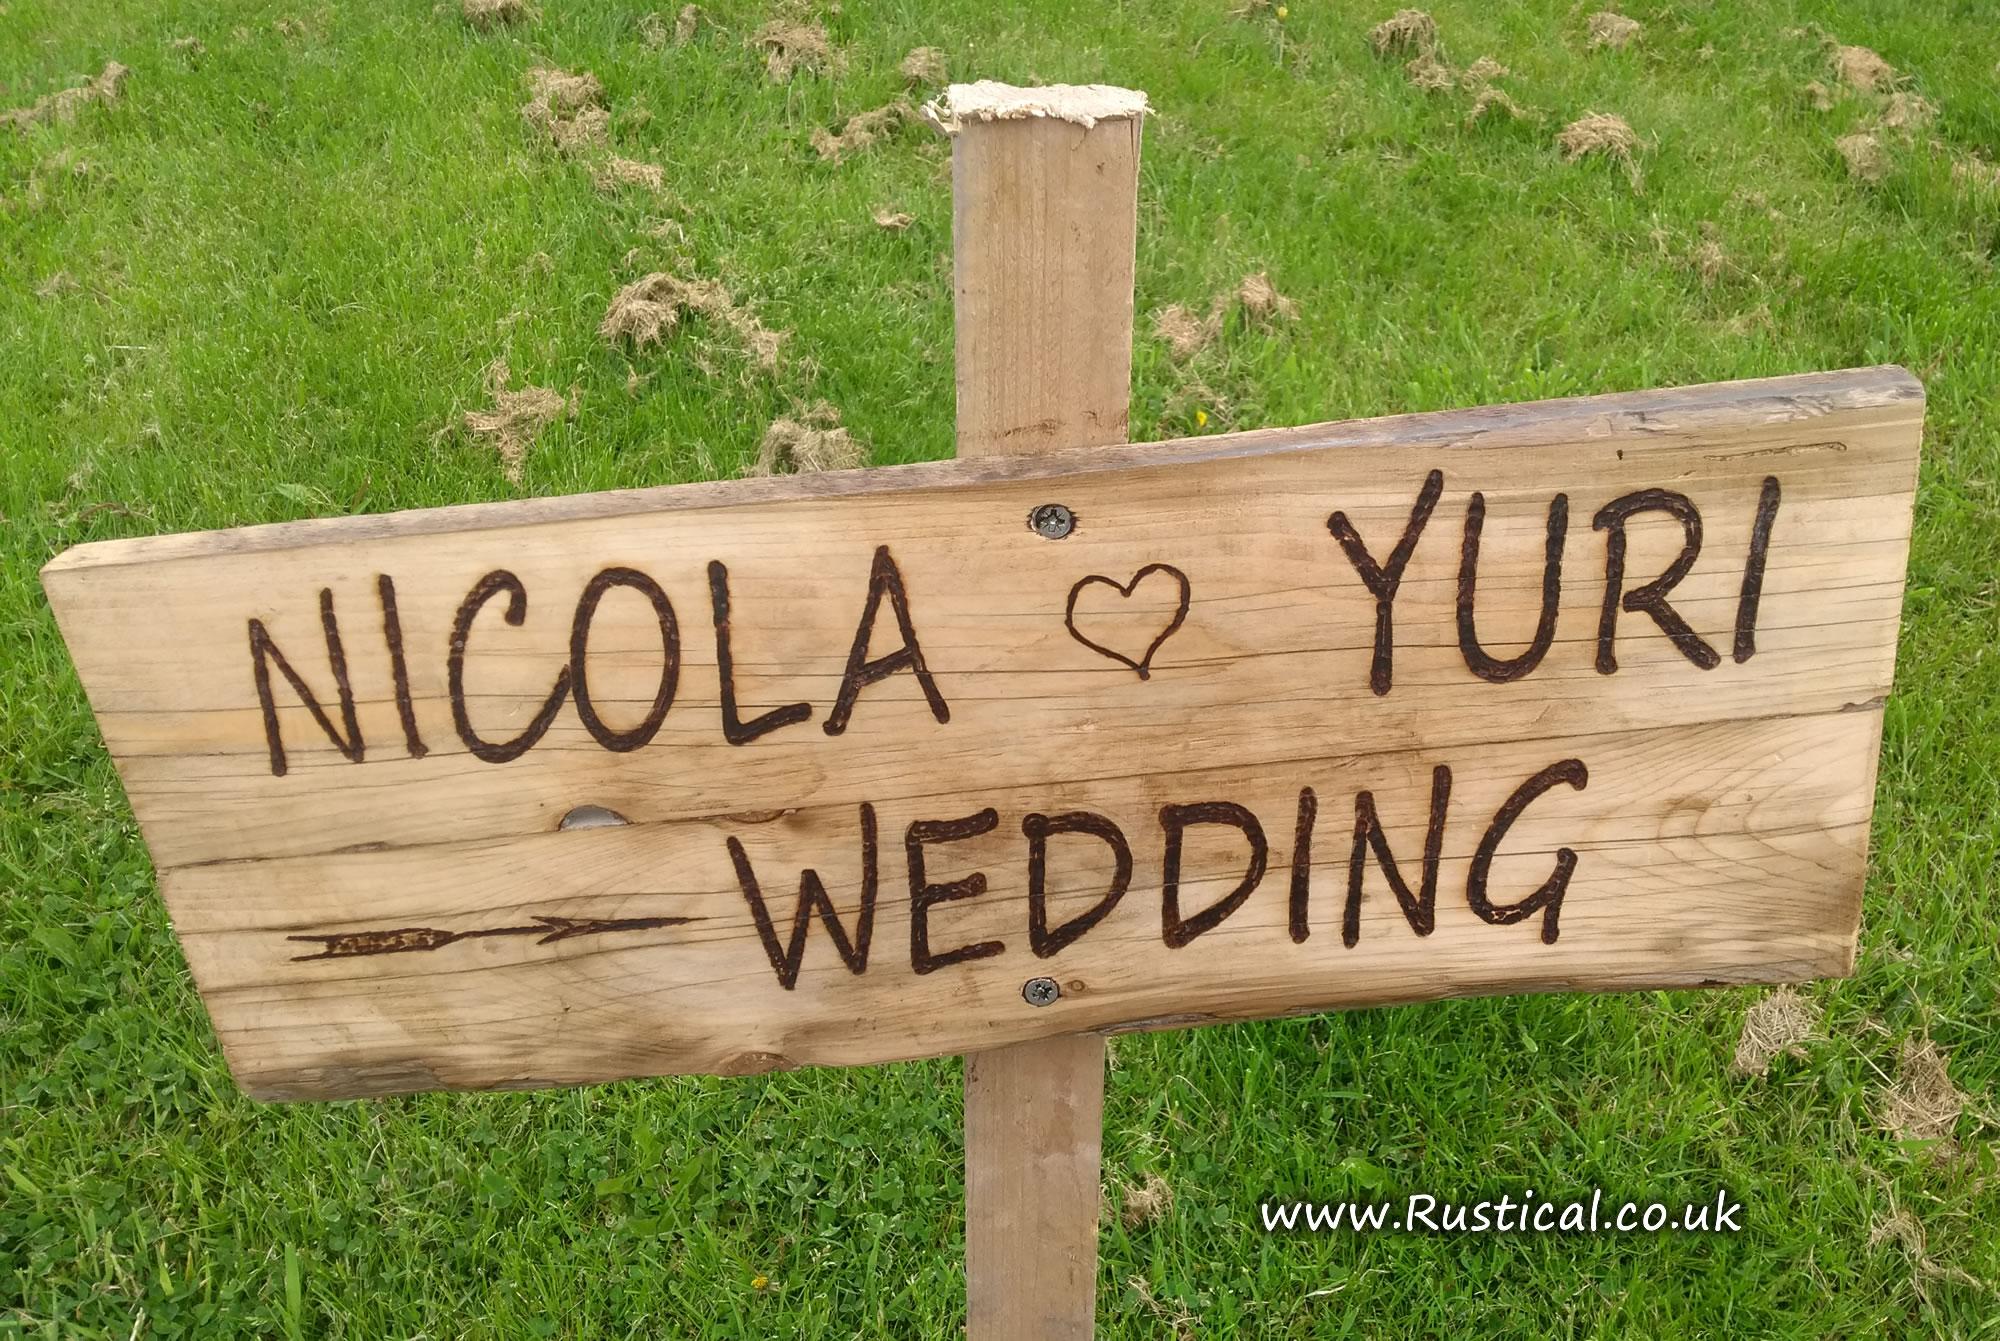 Rustic Wedding Sign for Nicola and Yuri